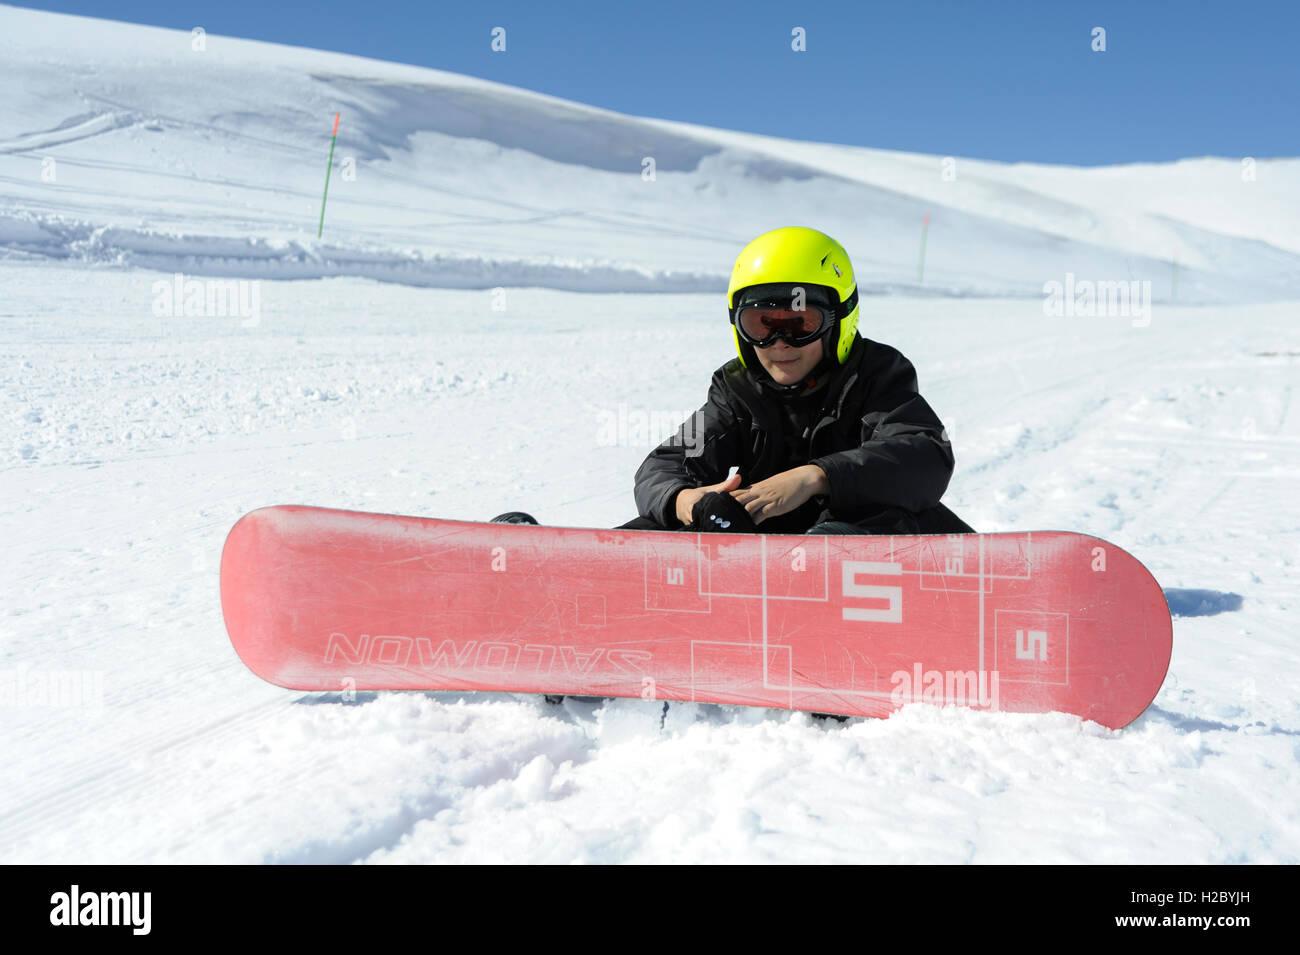 Teen with his snowboard, Faraya (Mzaar Kfardebian) ski resort, Lebanon - Stock Image